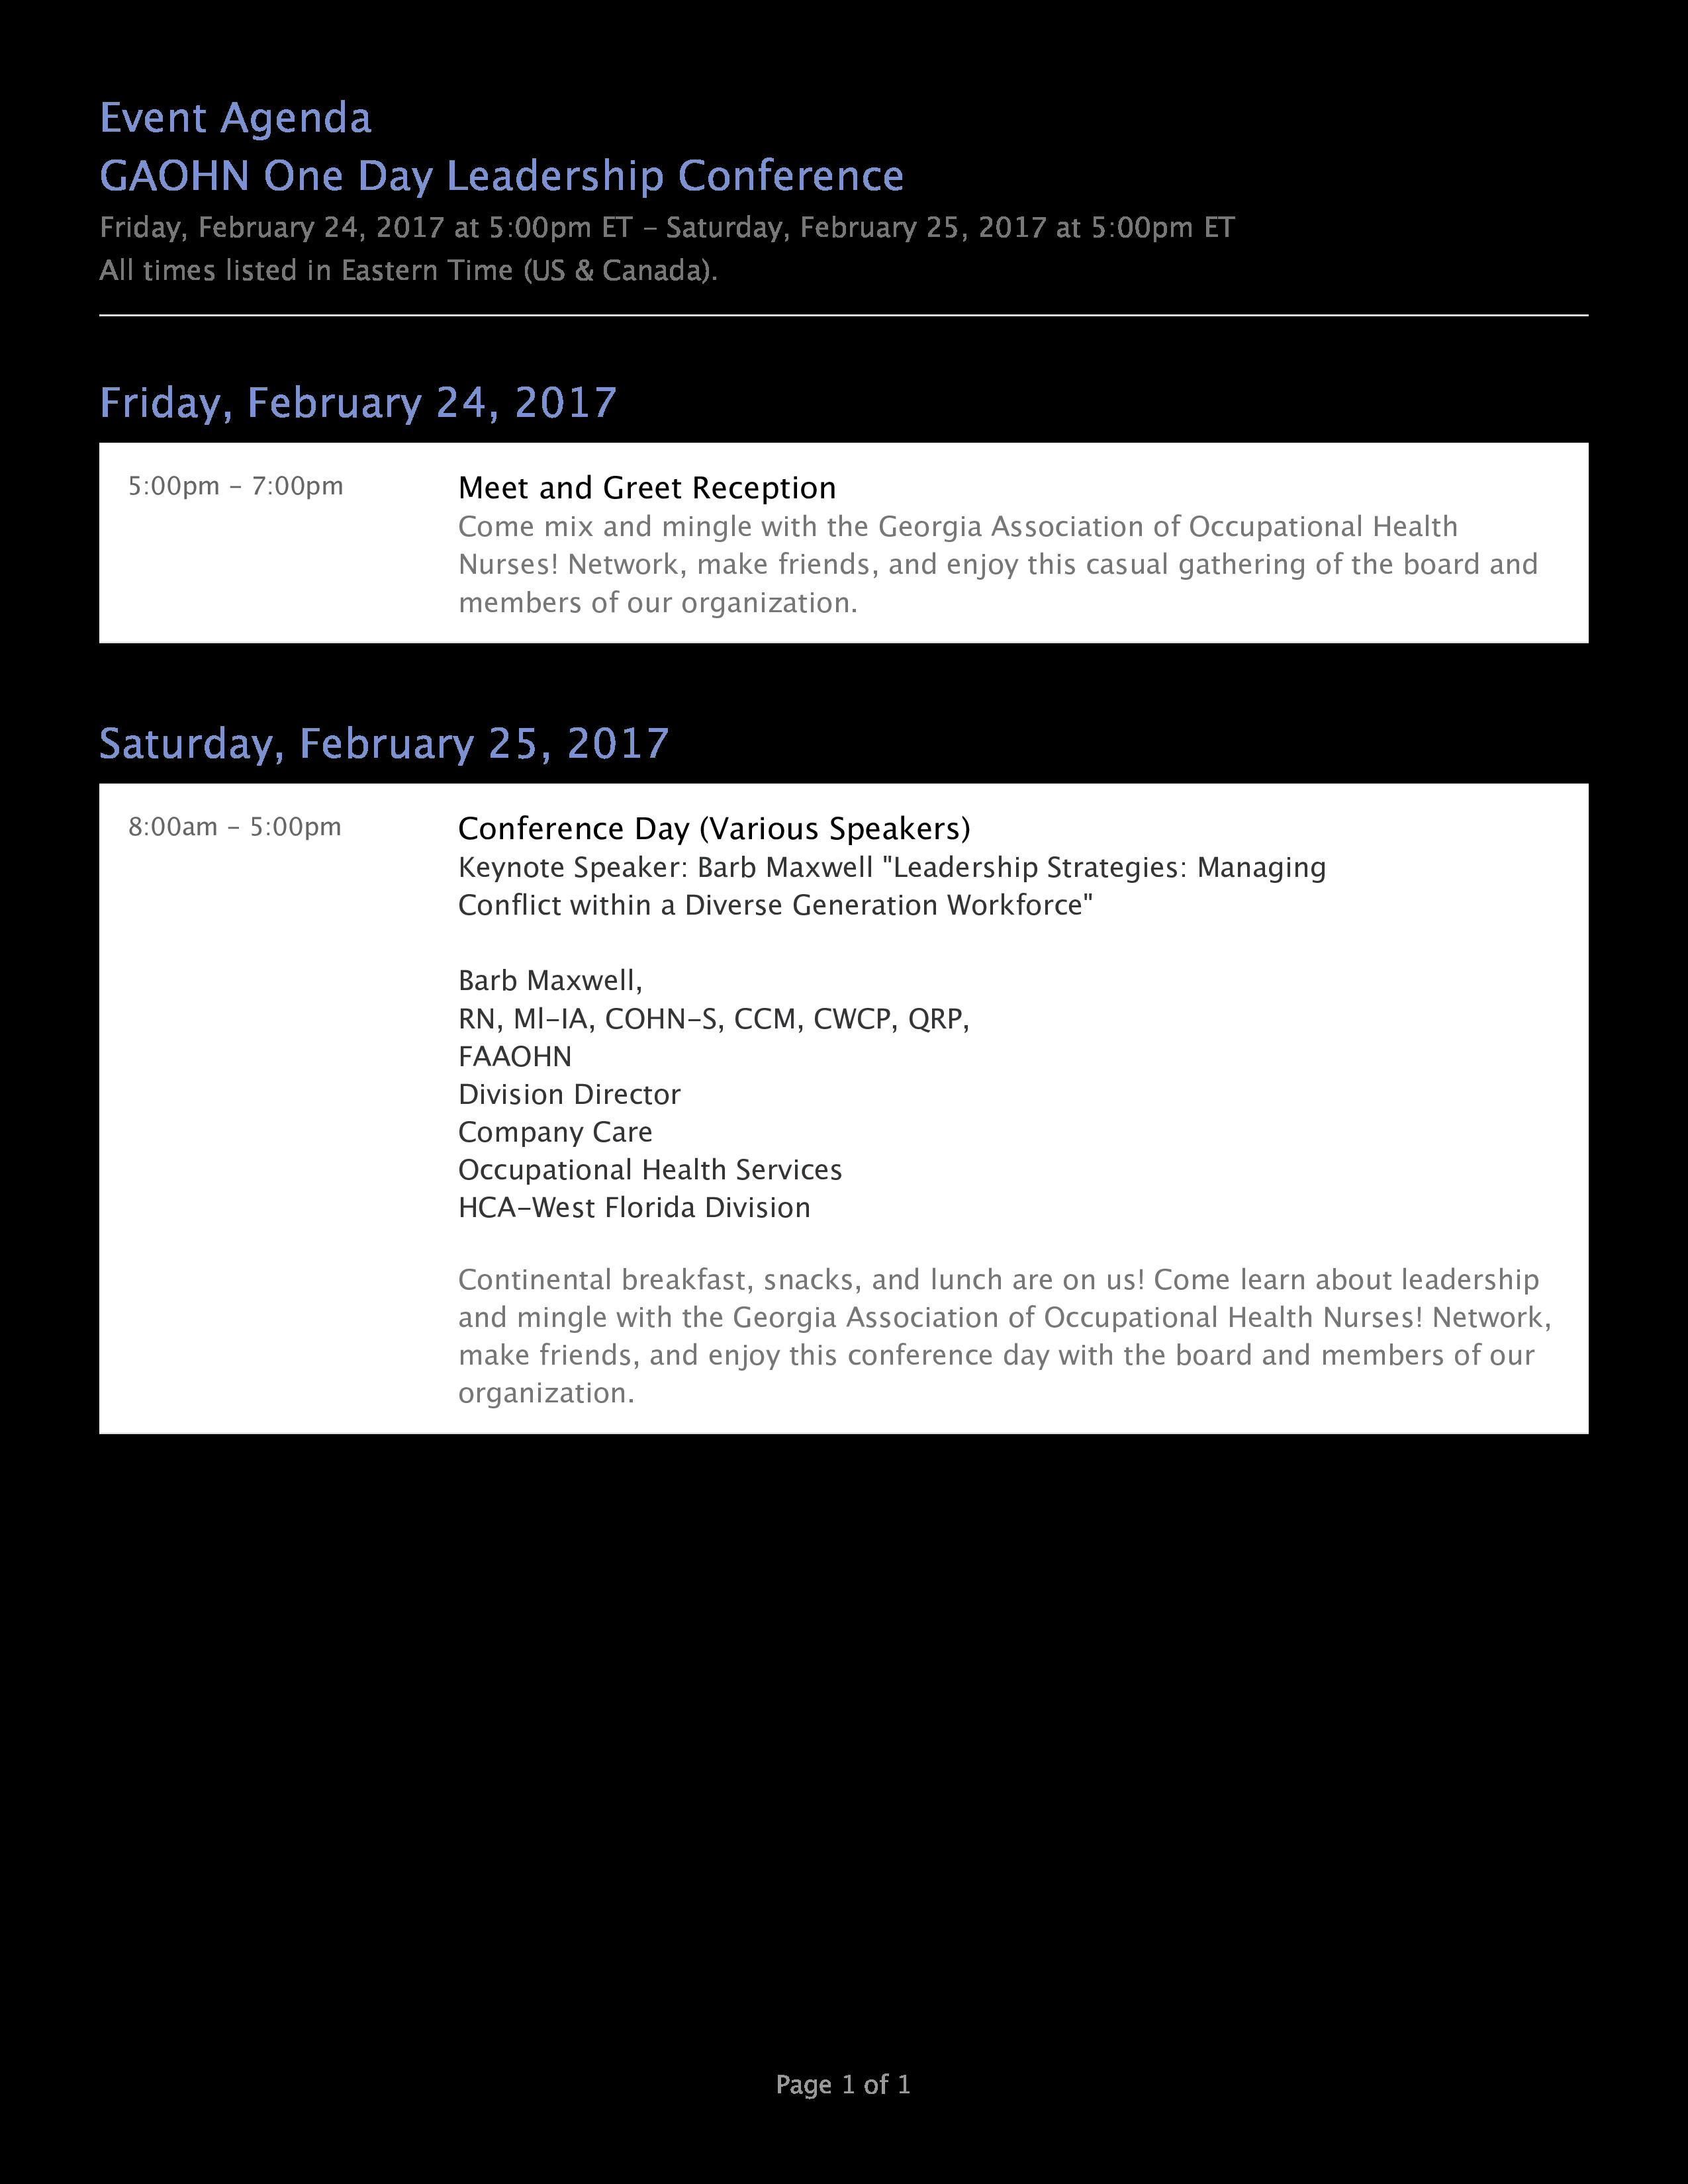 Leadership Event Agenda | Templates at